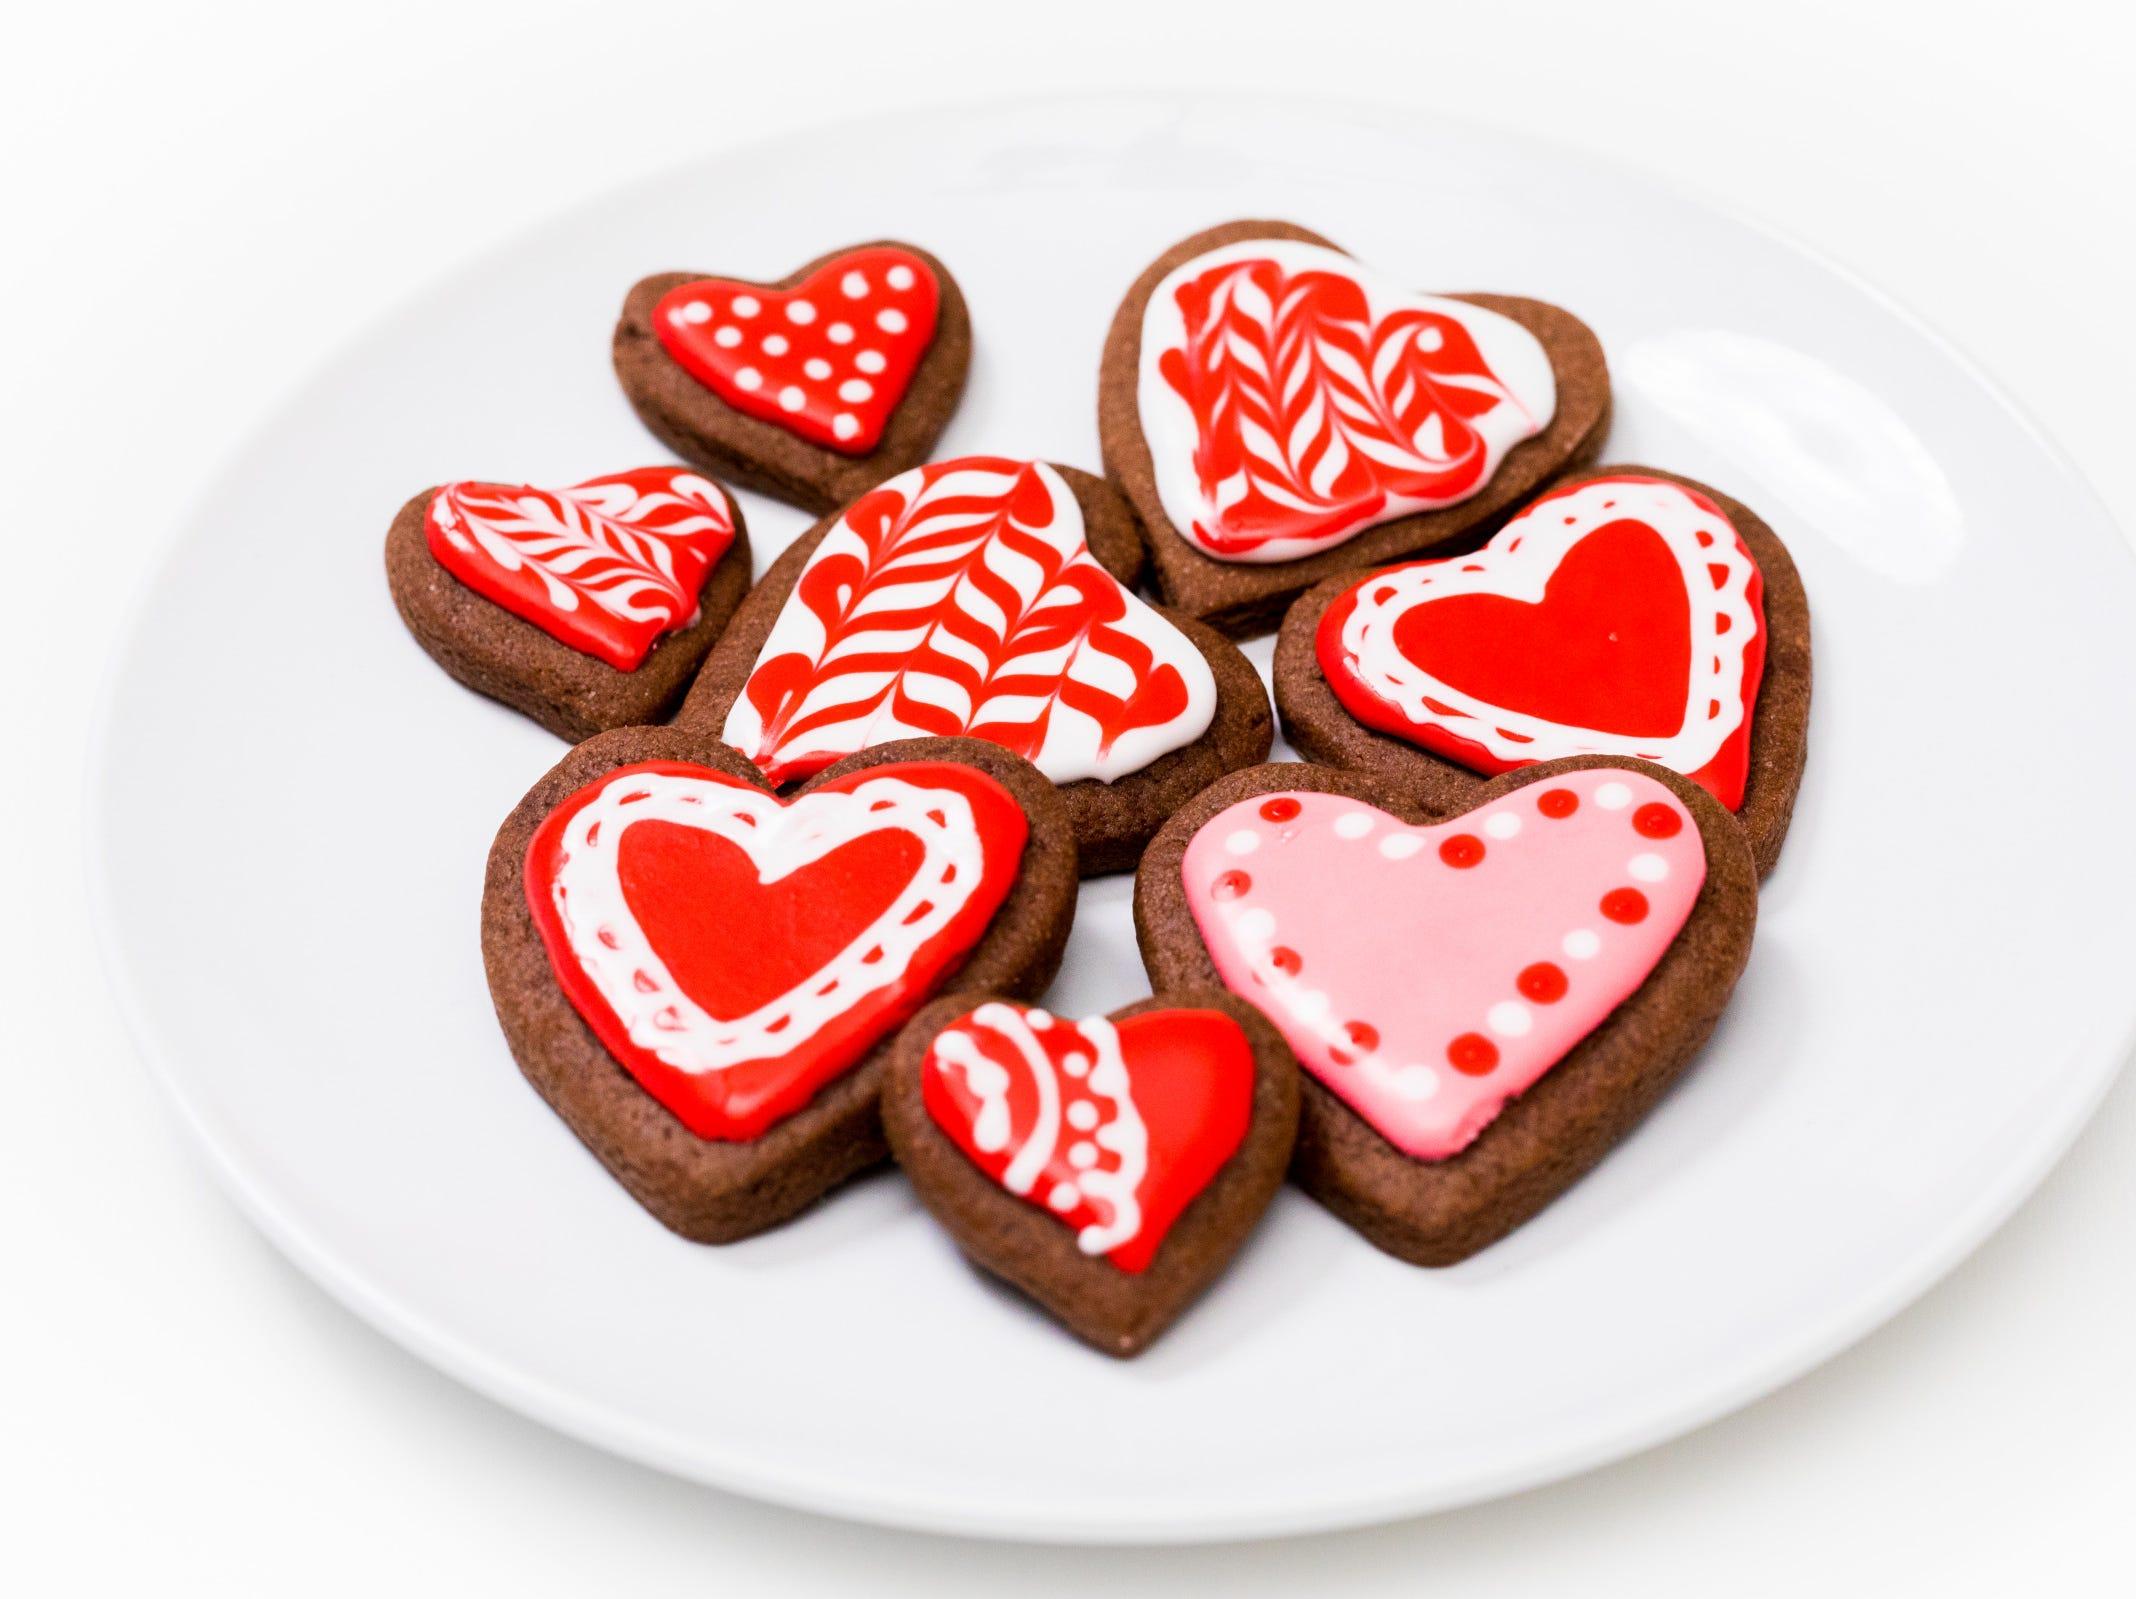 Heart-shaped brownie cutout cookies